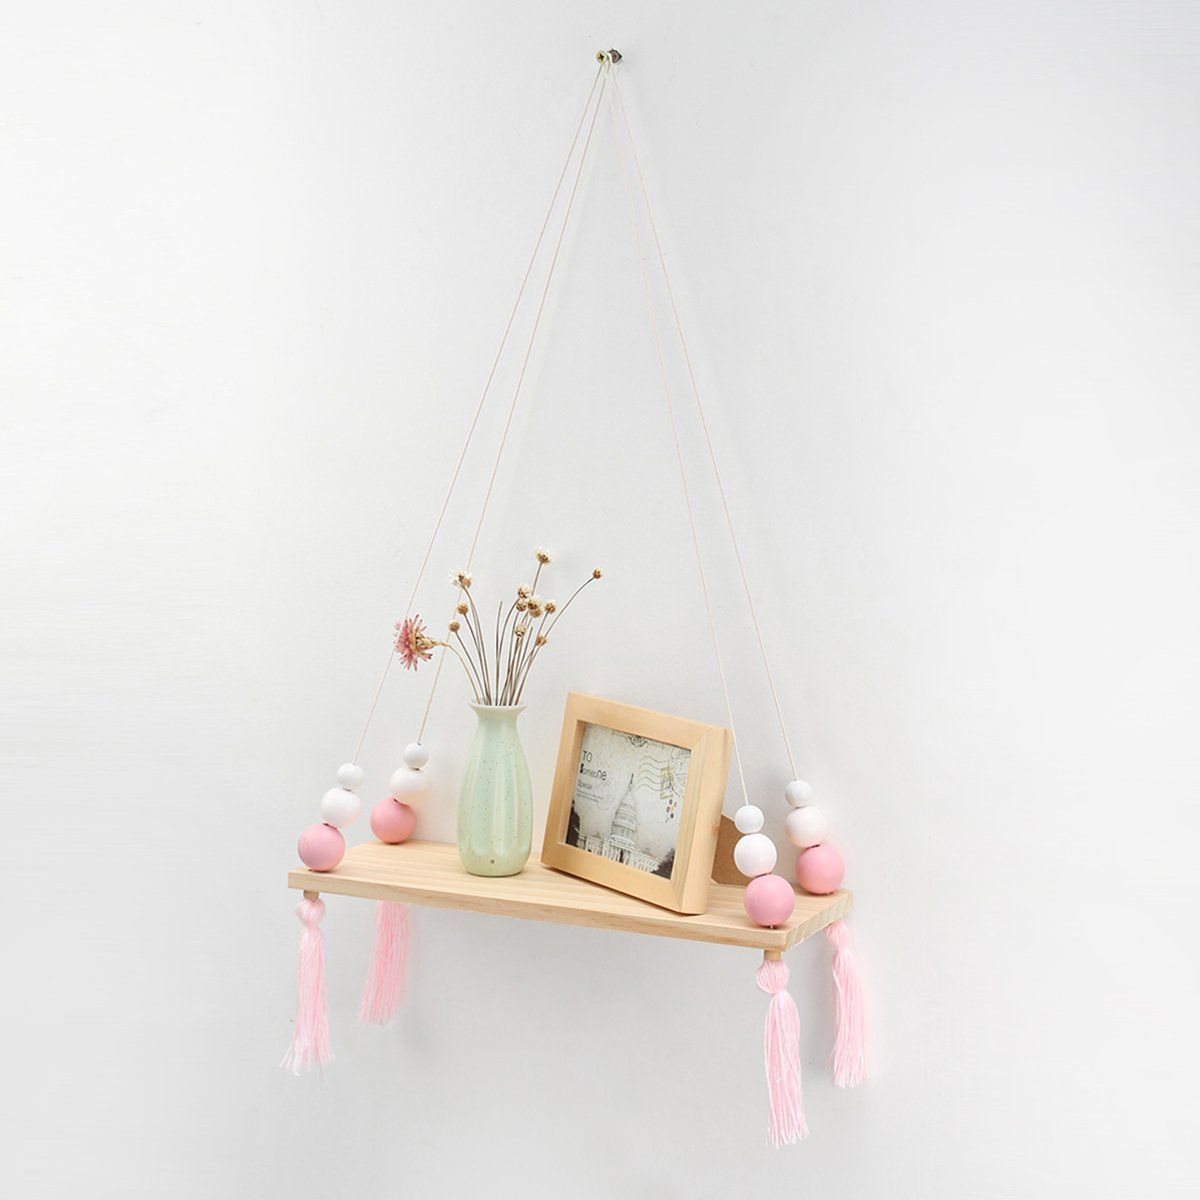 "KINGSO Macrame Display Wall Hanging Shelf Swing Rope Macarons Floating Shelves Home Decor,Distressed Wood Hanging Swing Rope Floating Shelves Wood Suspended Hanging Shelf 20"""